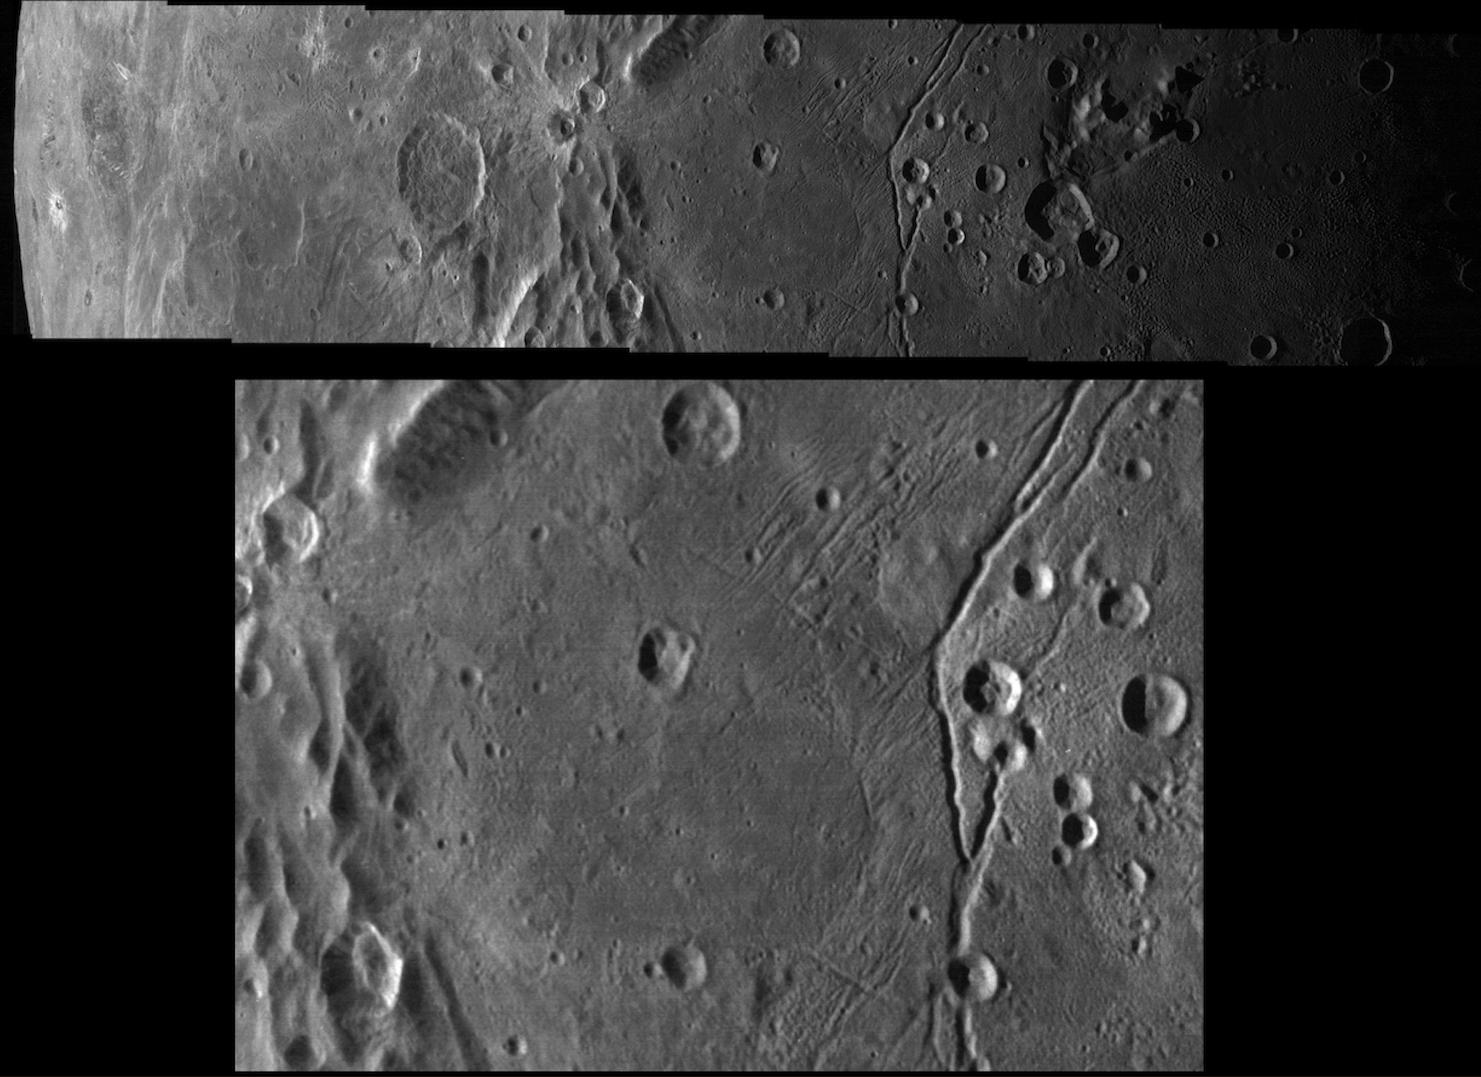 pluto-moon-charon-up-close-2